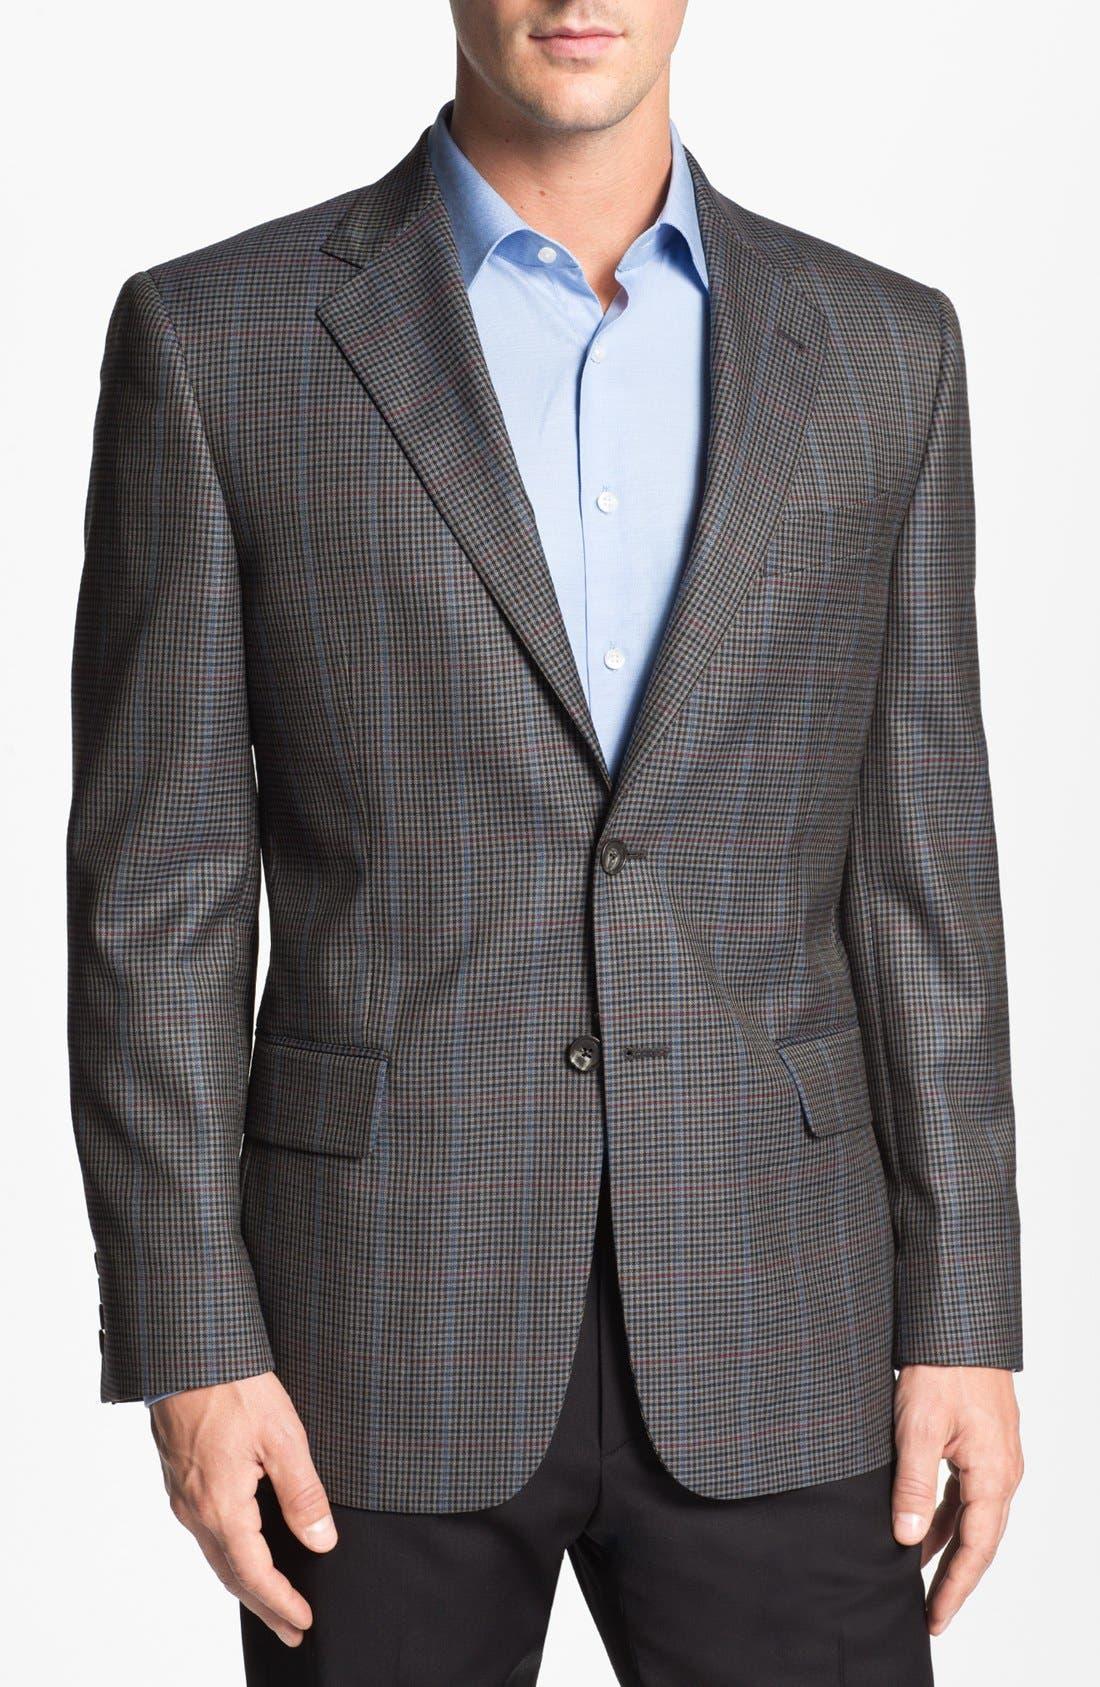 Main Image - Joseph Abboud 'Signature Silver' Check Wool Sportcoat